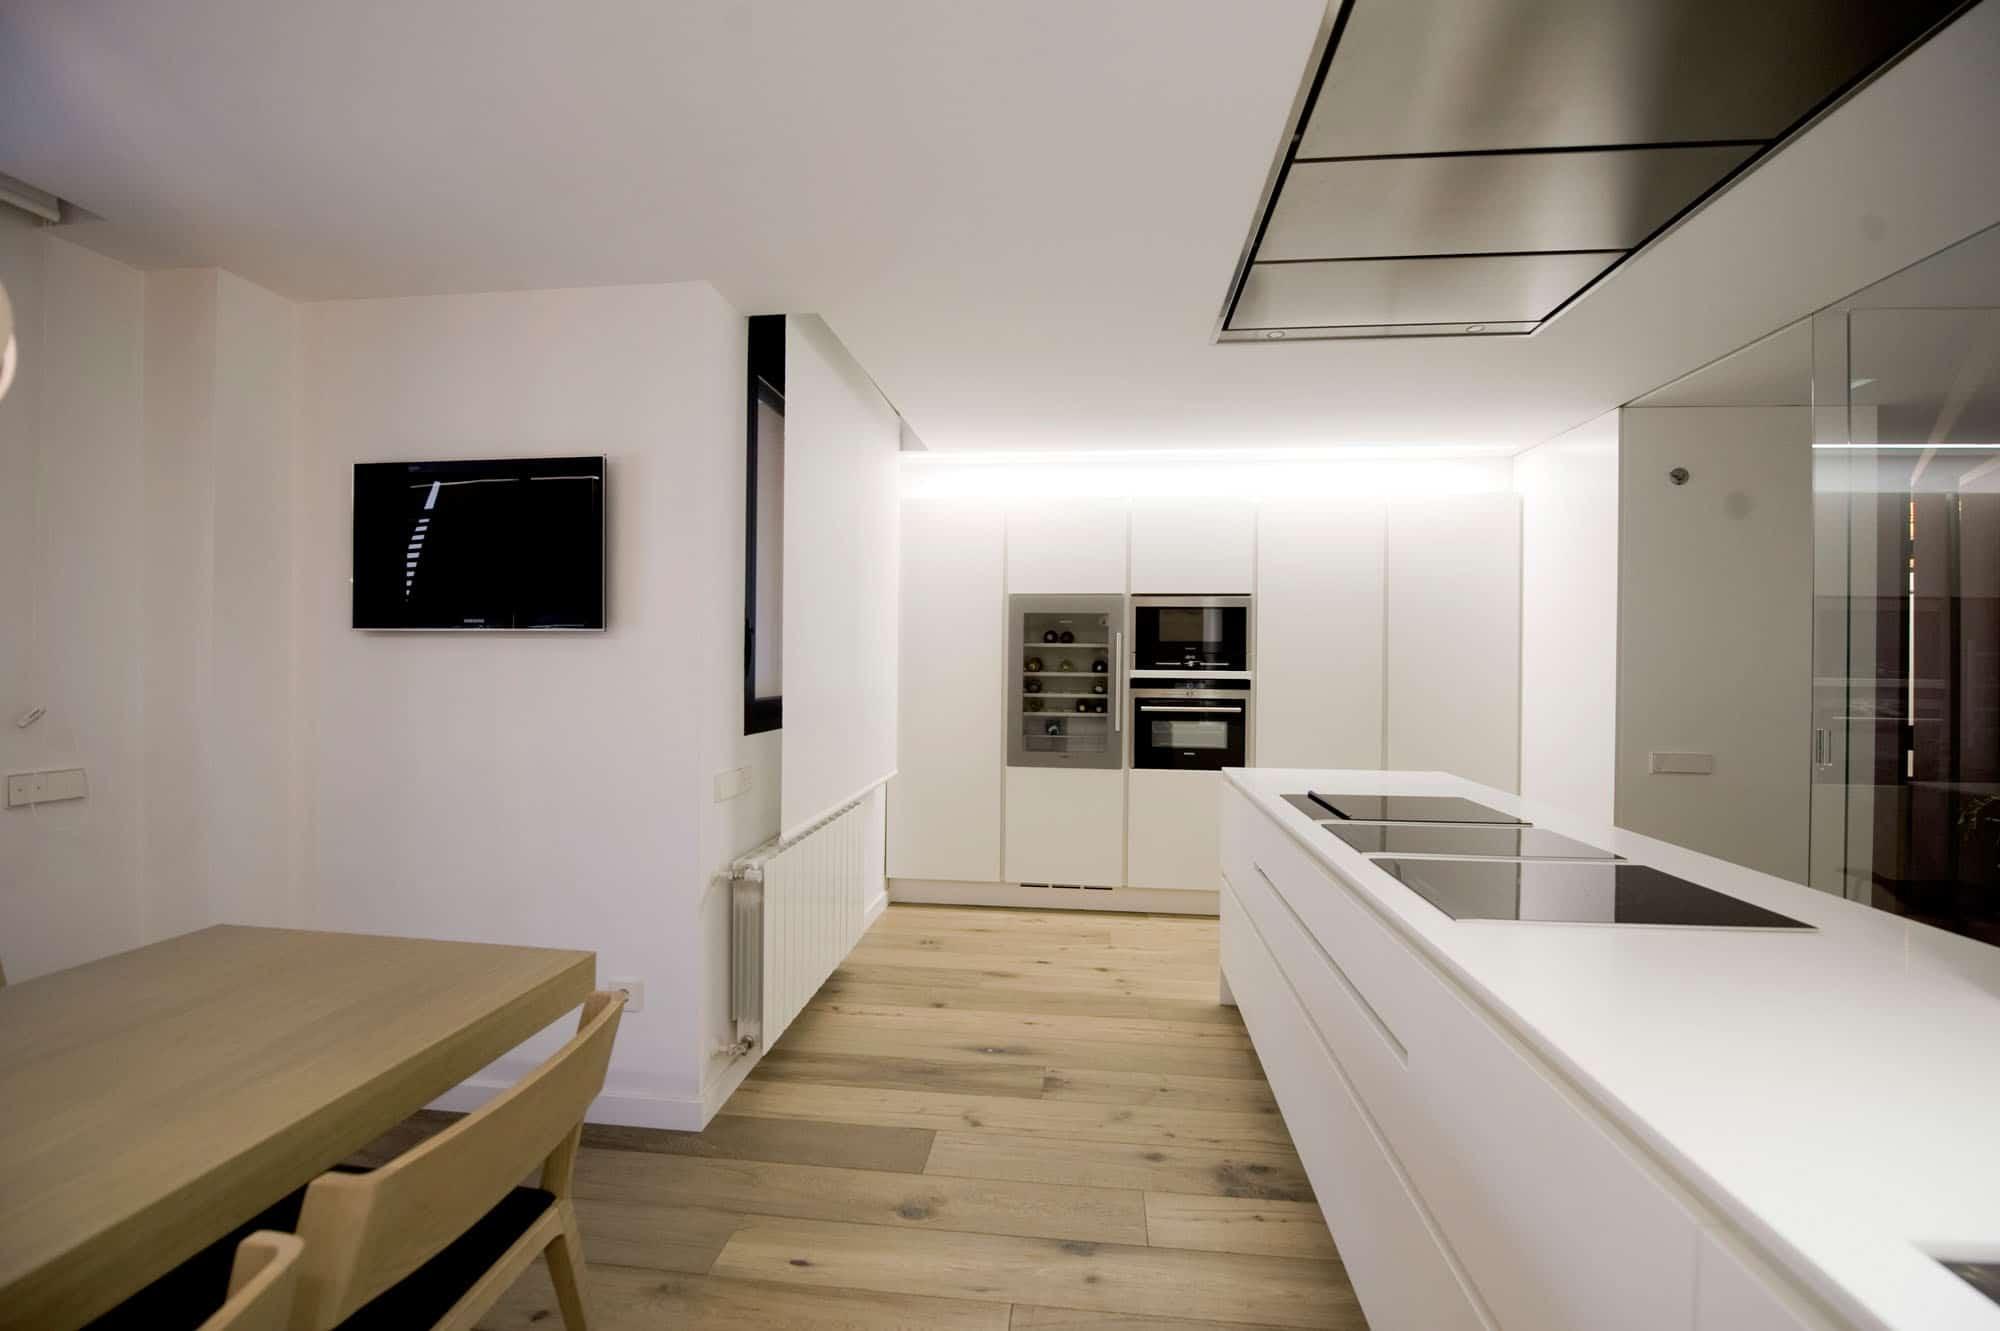 HI-MACS Doble Dueto Apartment by Cuartopensante (17)